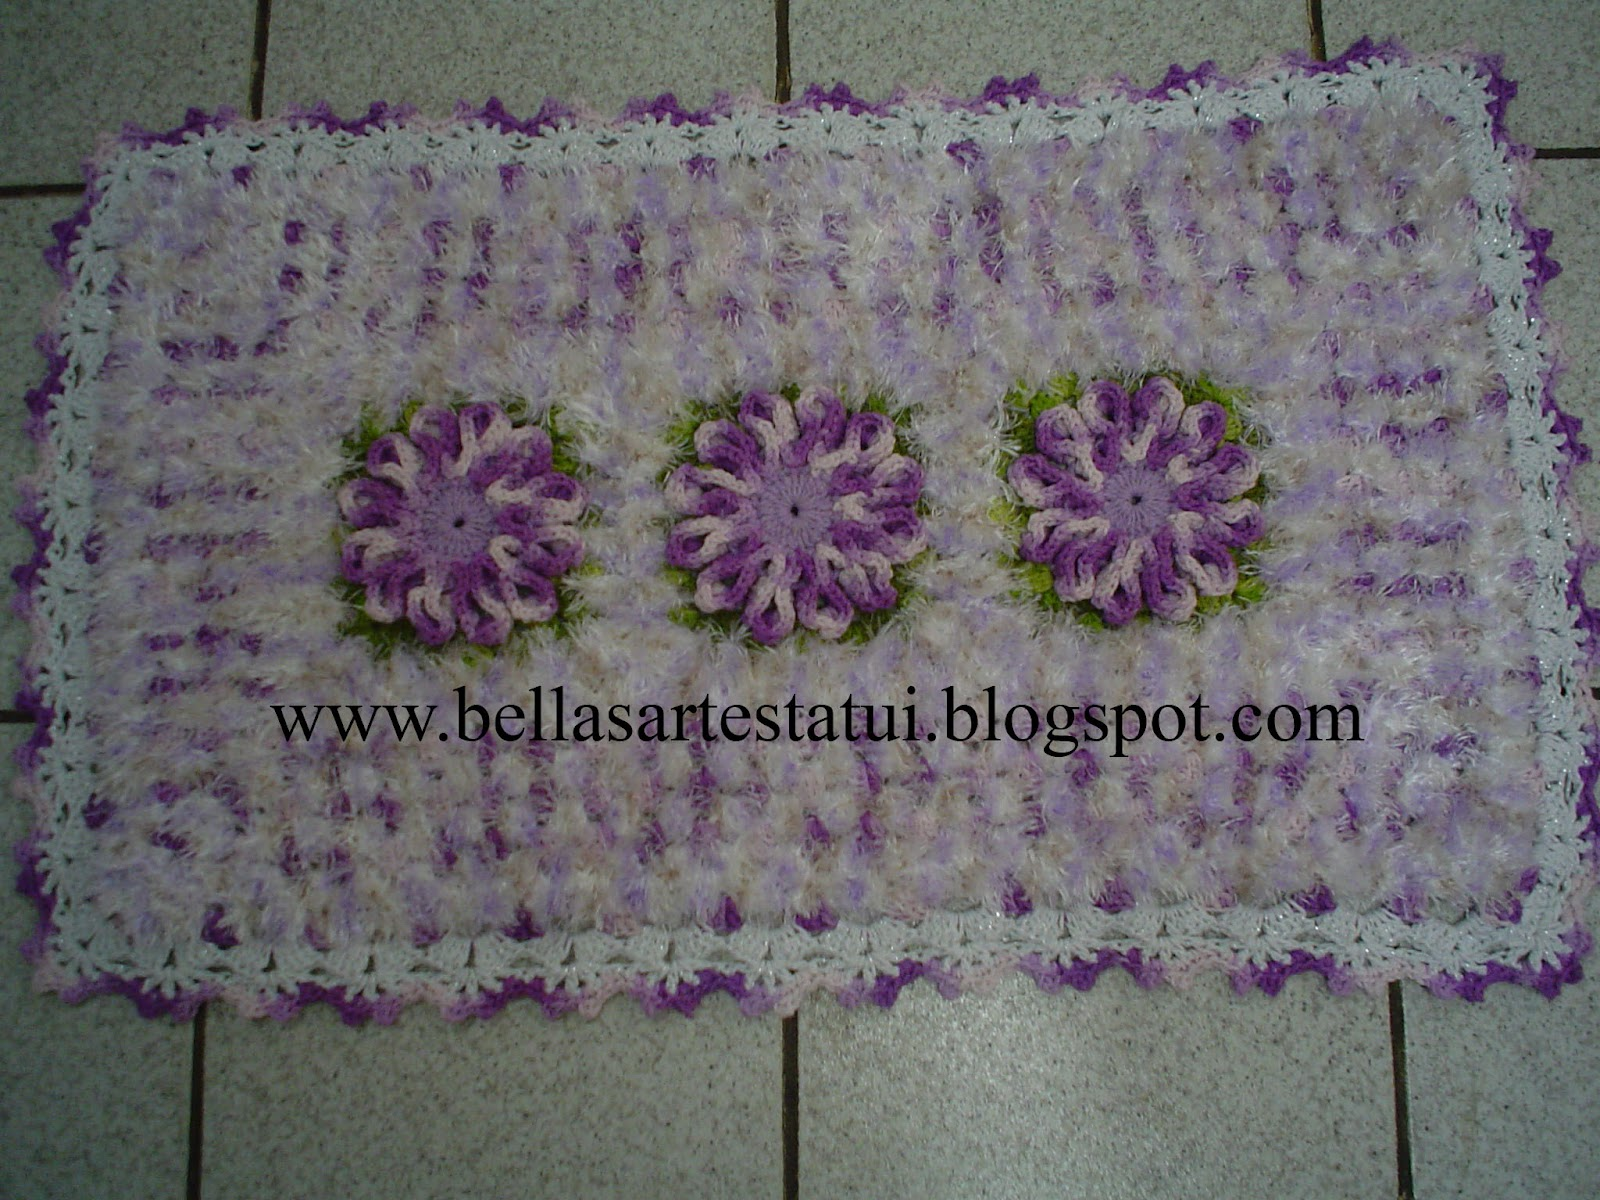 bellas artes tatui tapete croche flor delicada com. Black Bedroom Furniture Sets. Home Design Ideas